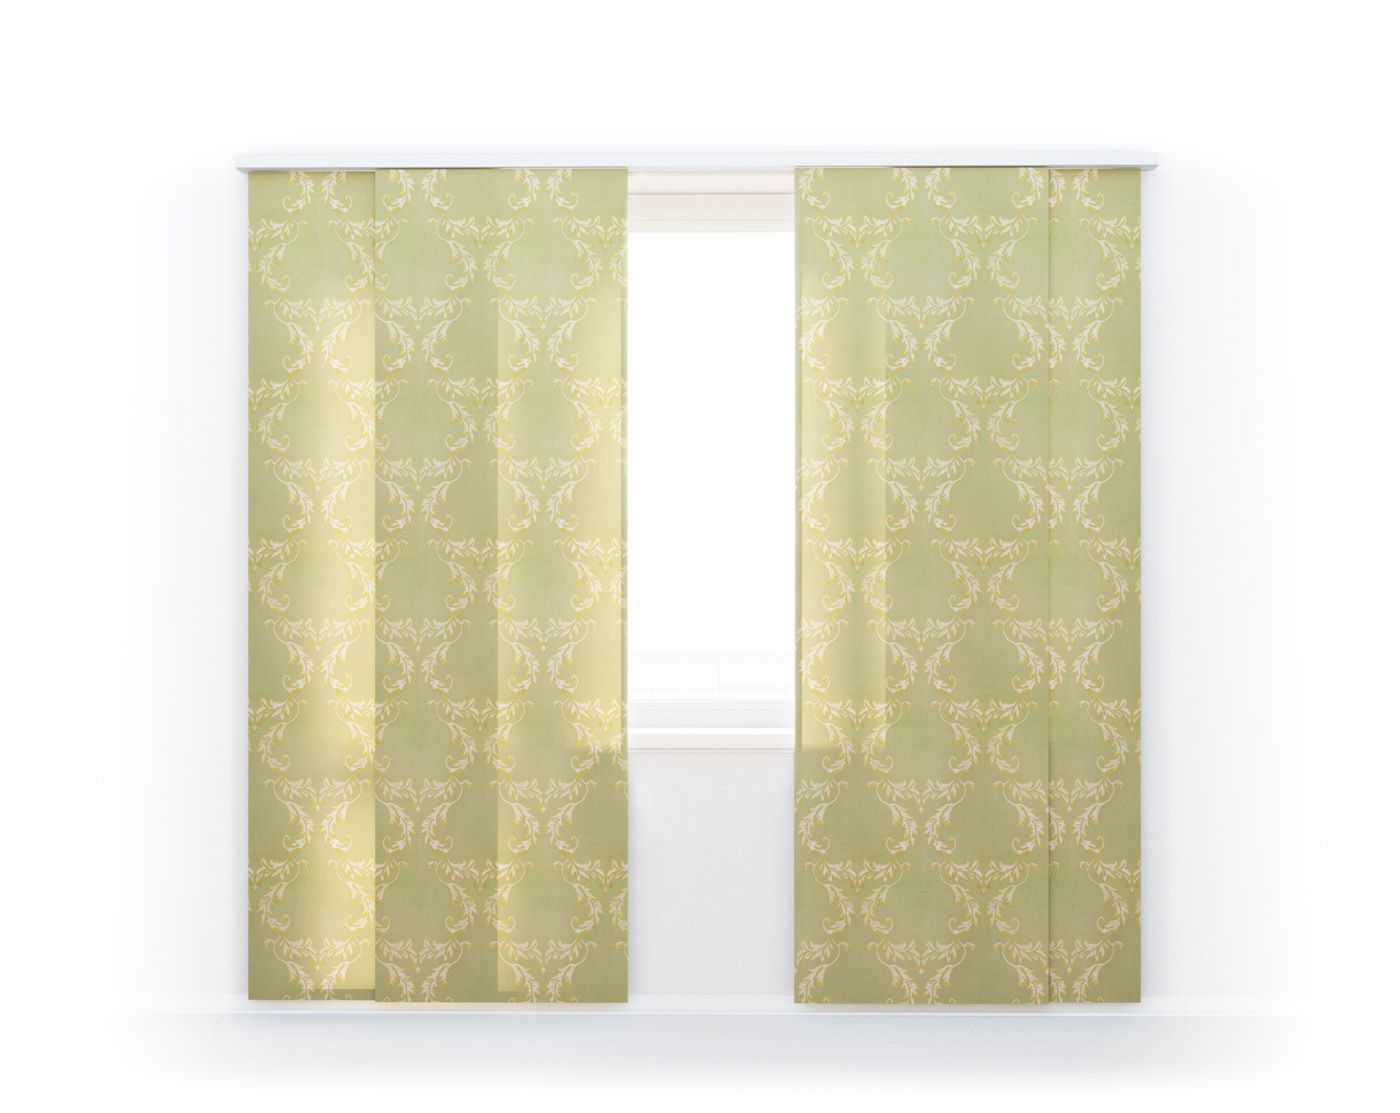 Японские шторы Louis D'or, 2375/51